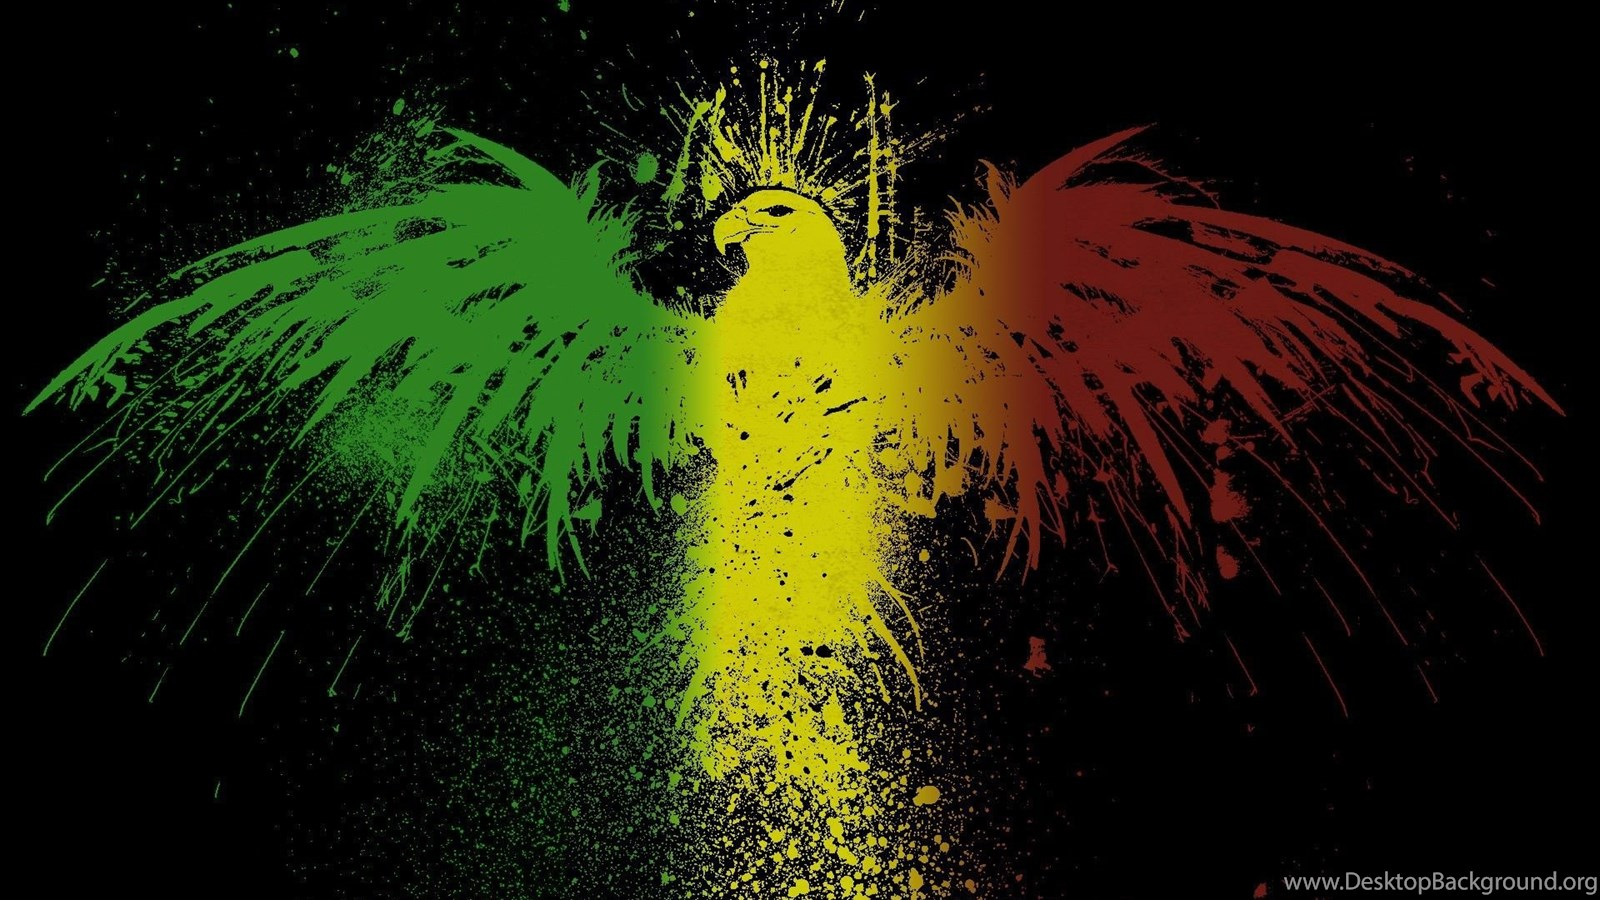 Rasta Eagle Jamaica Rastafarian Eagles Flags Black Backgrounds Mali